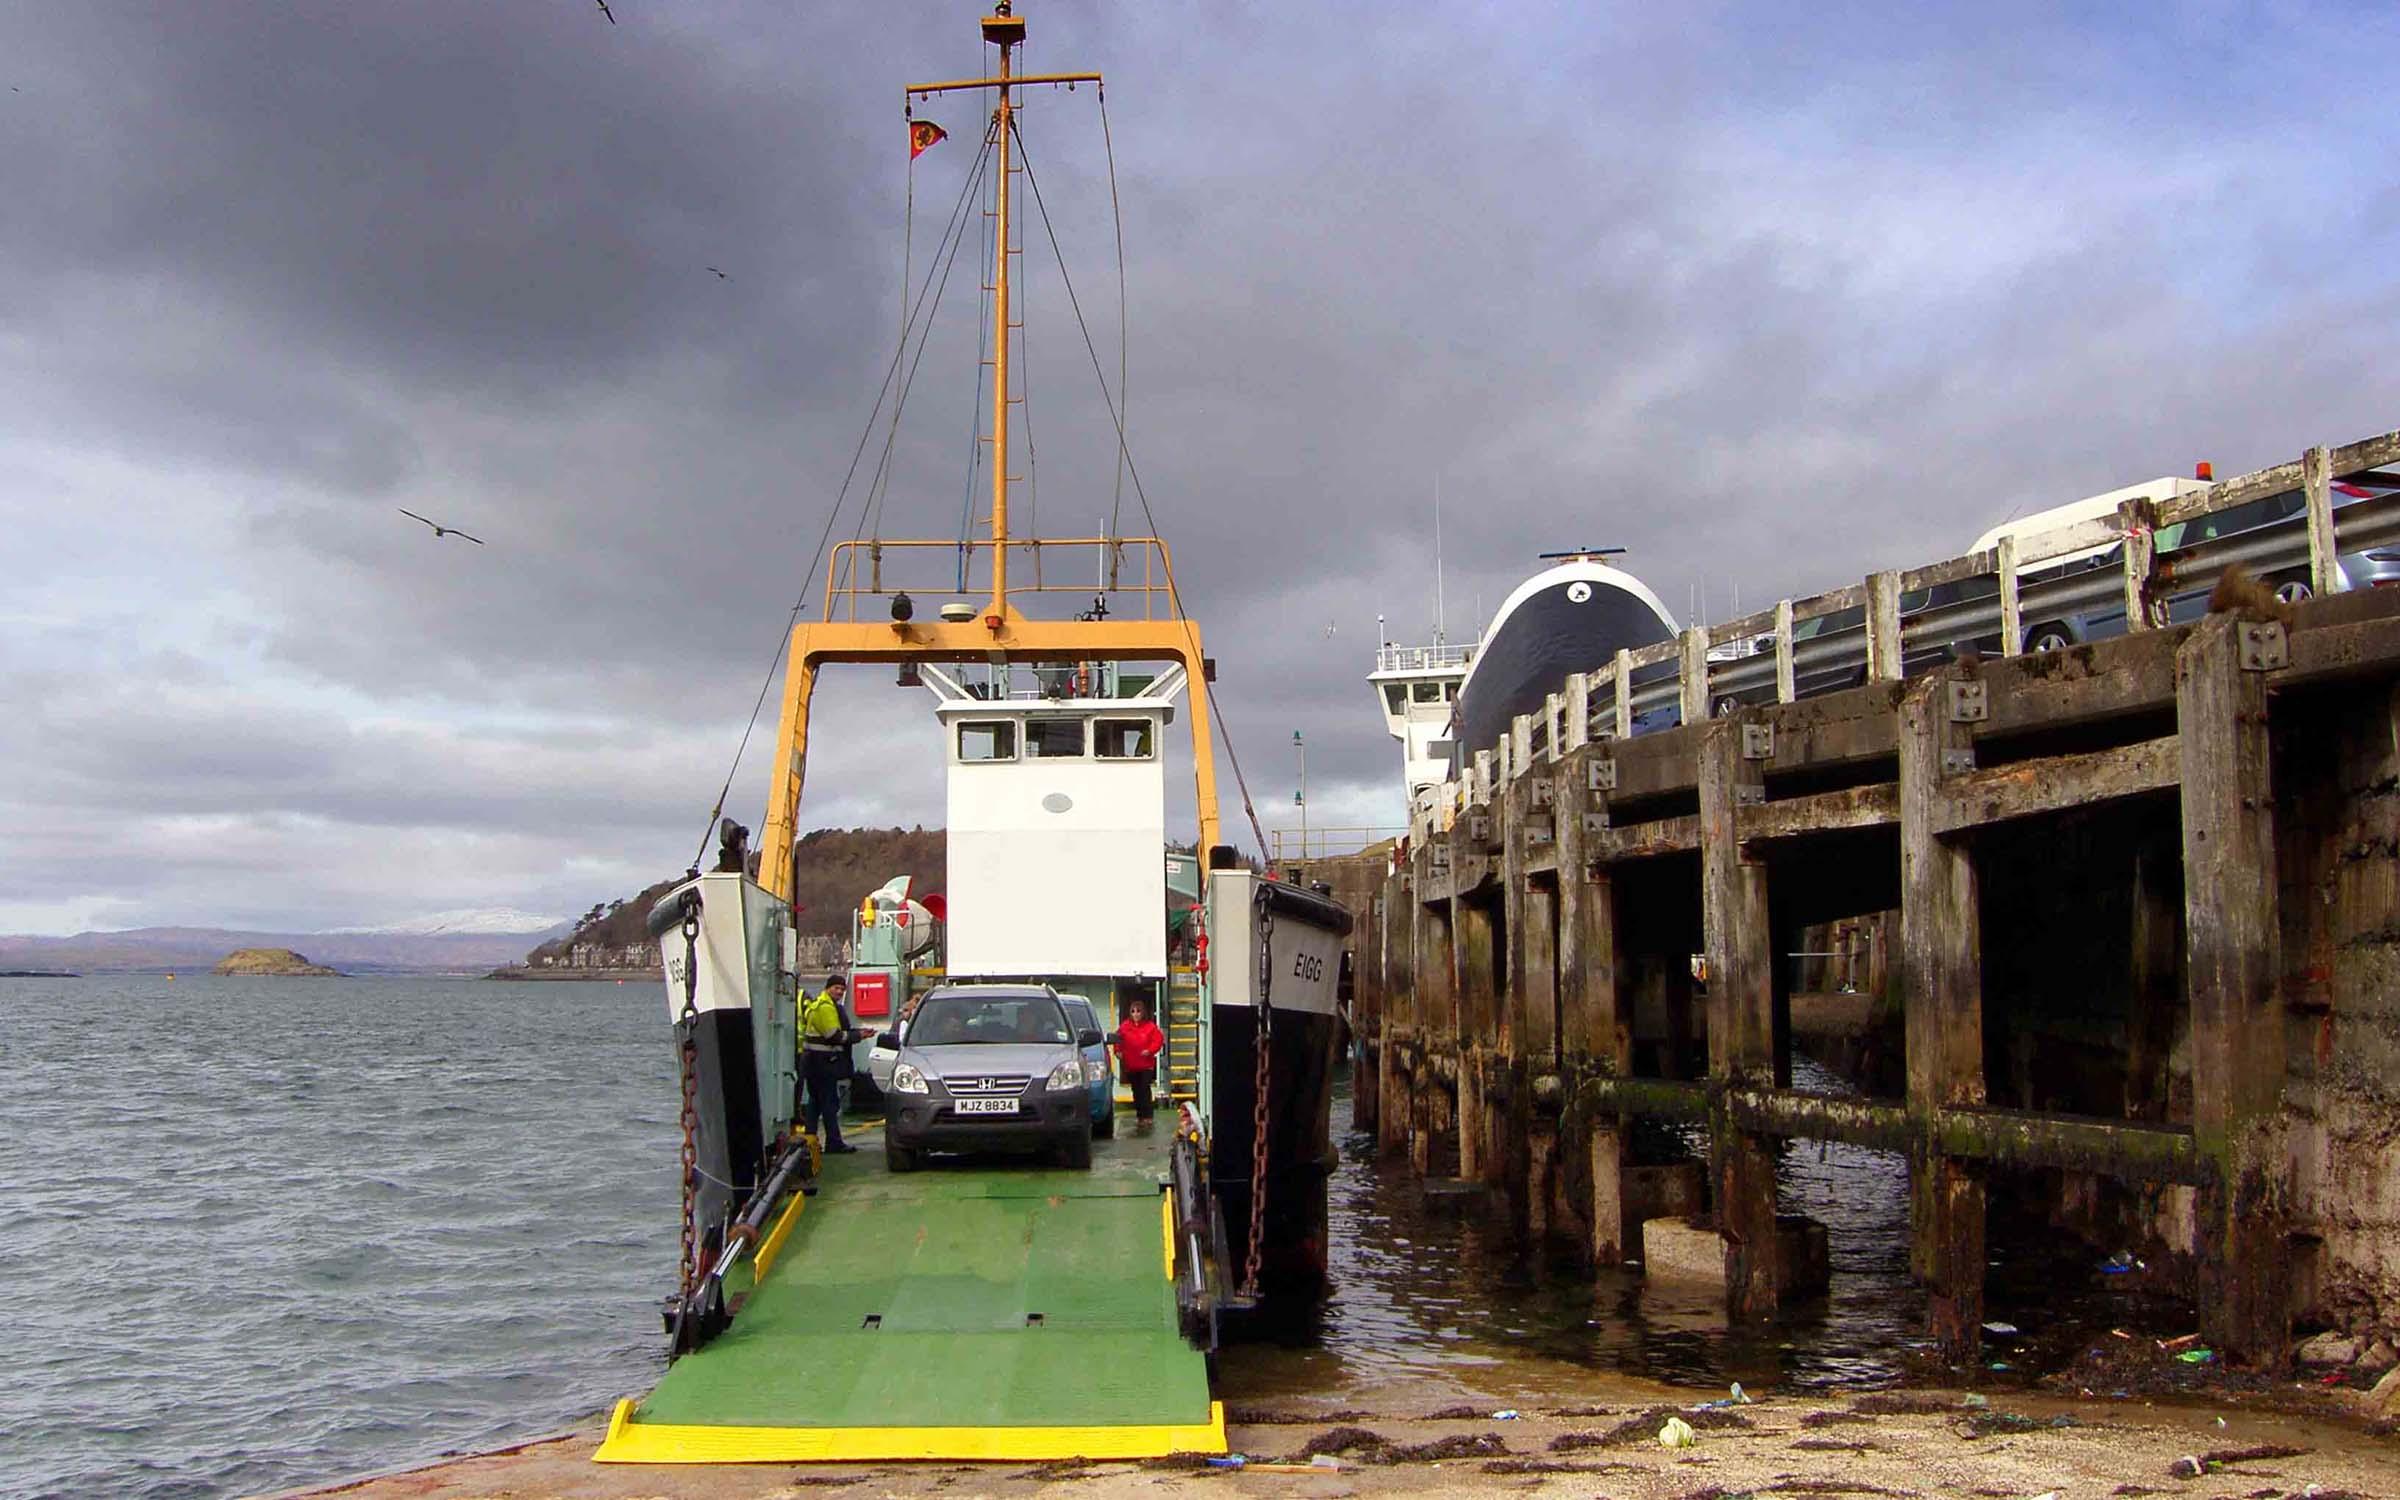 Eigg loading for Lismore (Ships of CalMac)